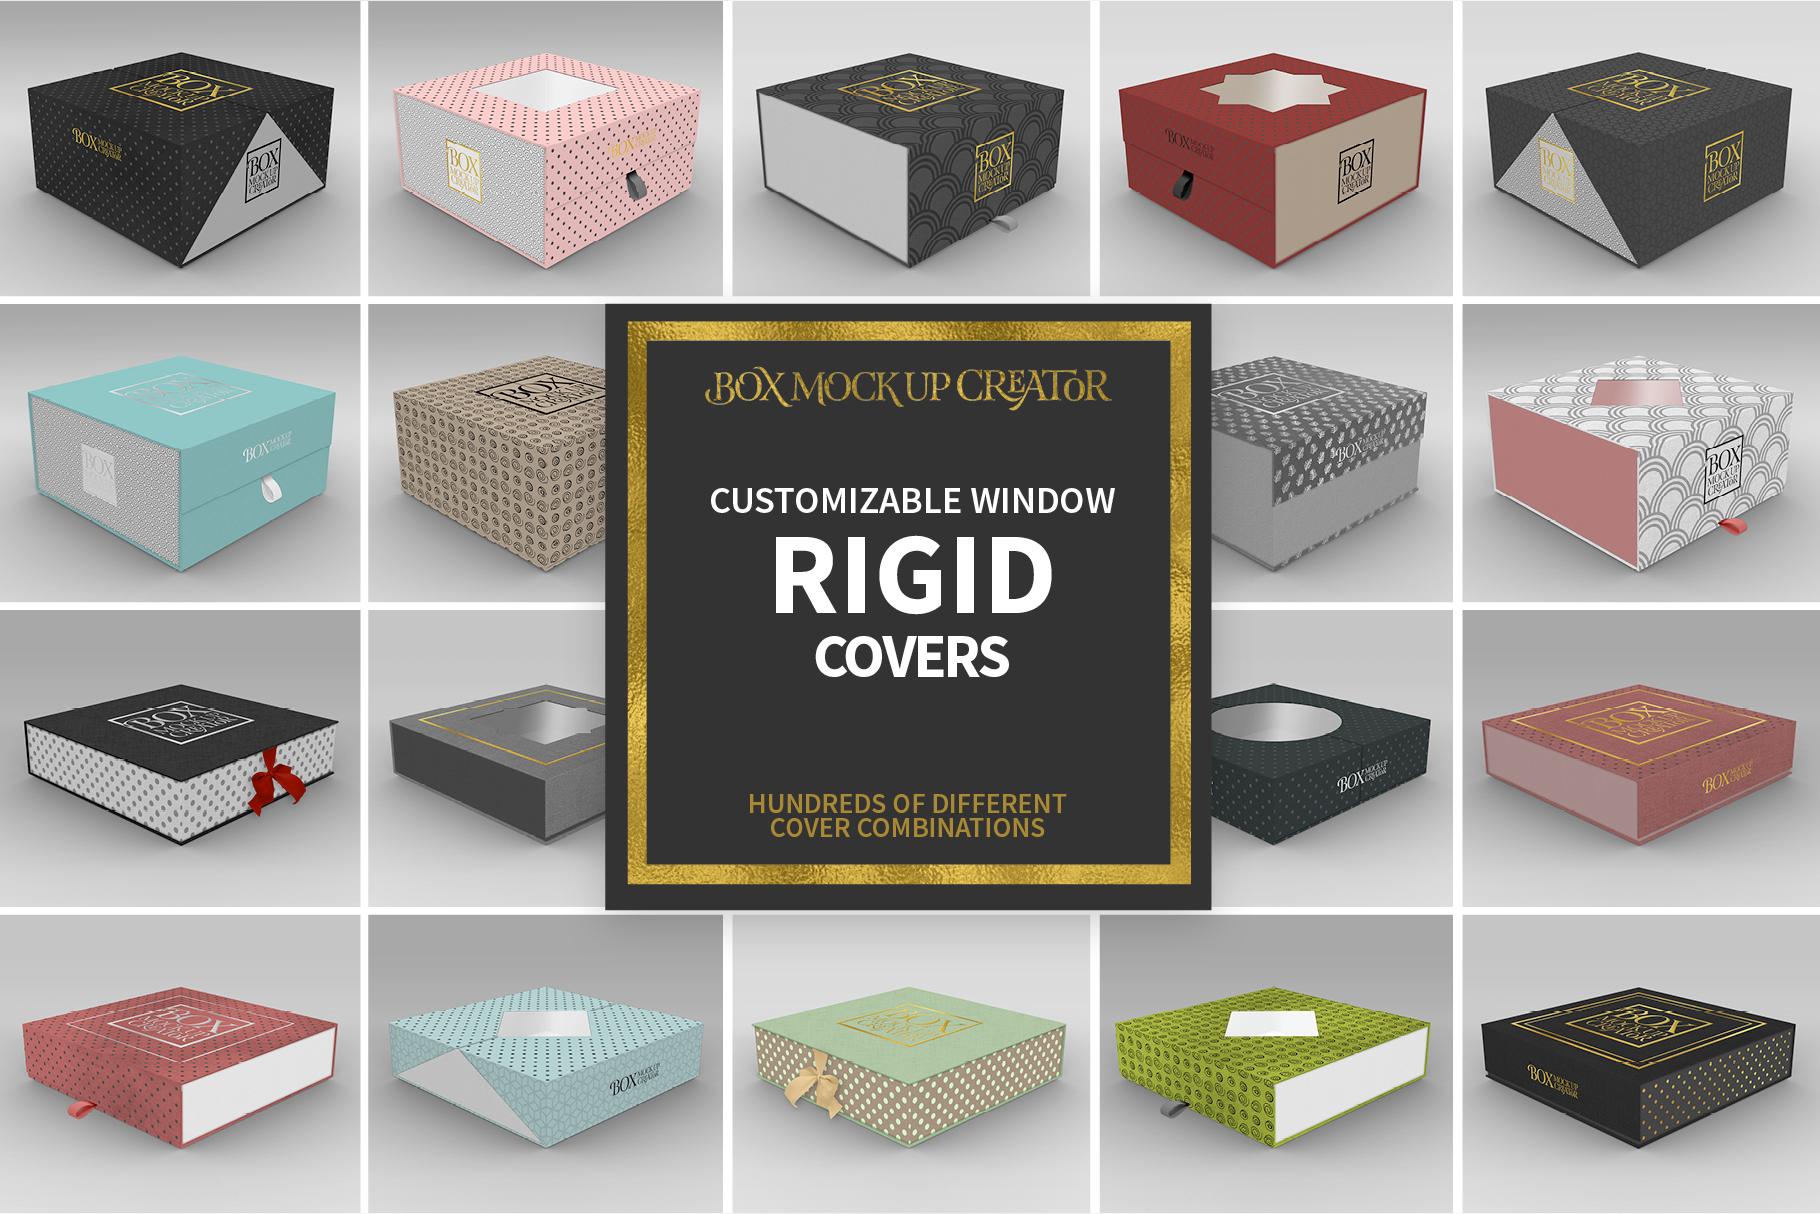 Square Box Packaging Mockup Creator example image 9